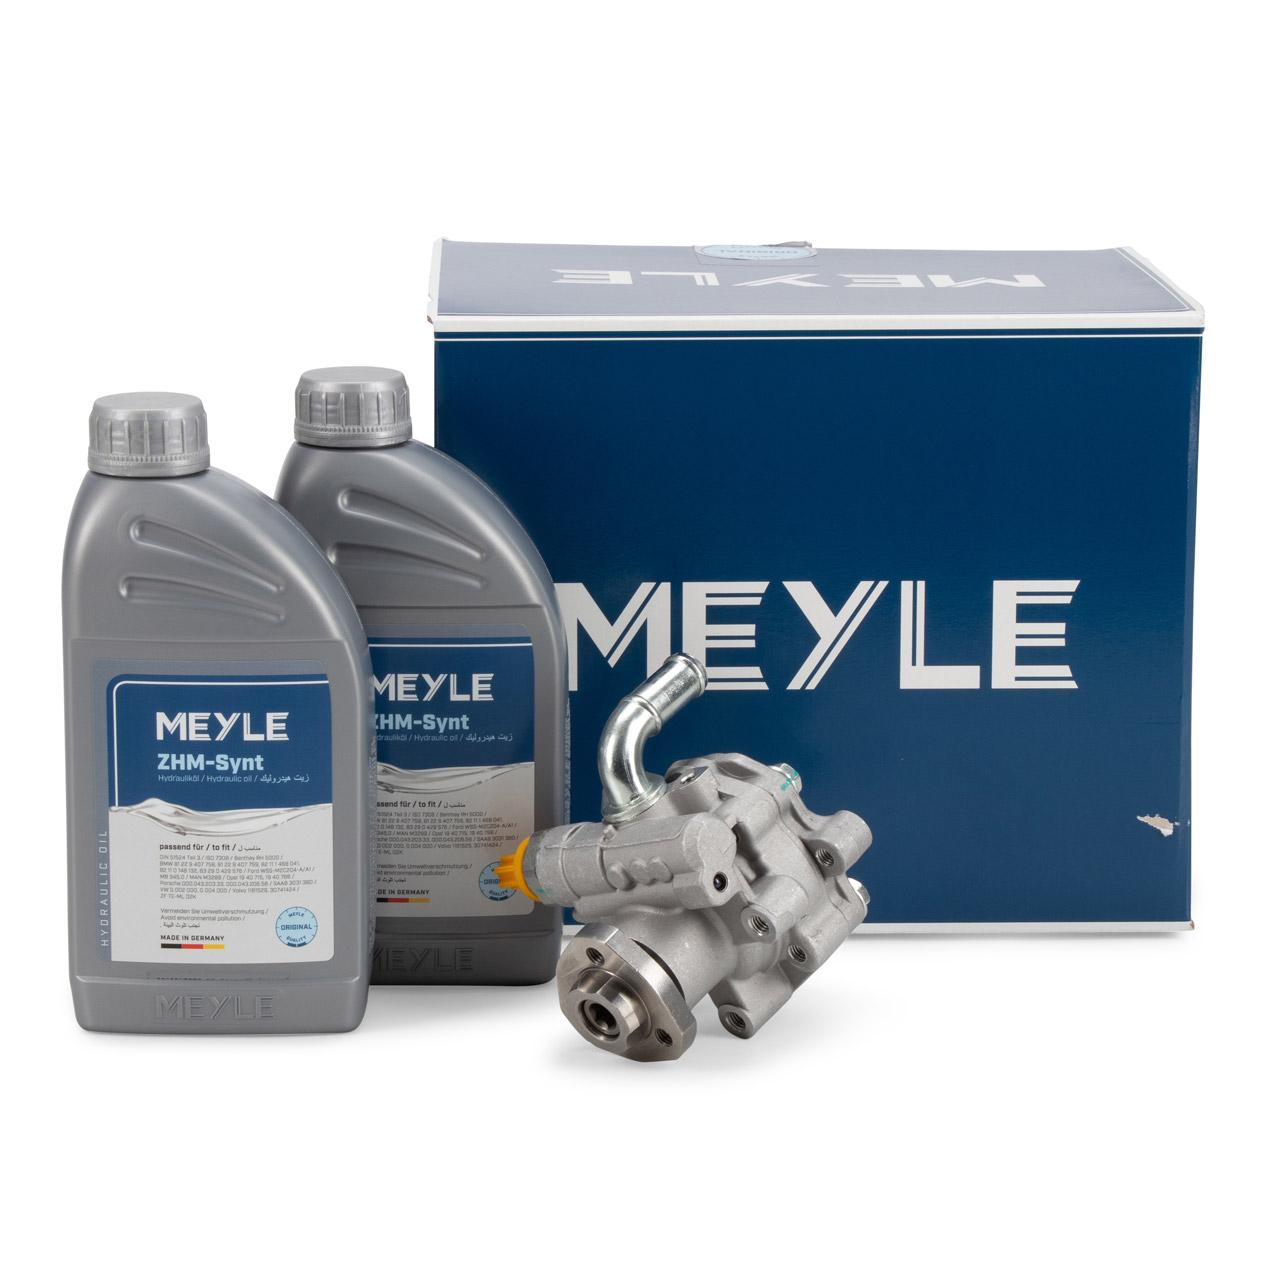 MEYLE Hydraulikpumpe + 2L Hydrauliköl AUDI A3 8L VW Golf 4 Polo 4 SEAT Leon SKODA 1.9 TDI